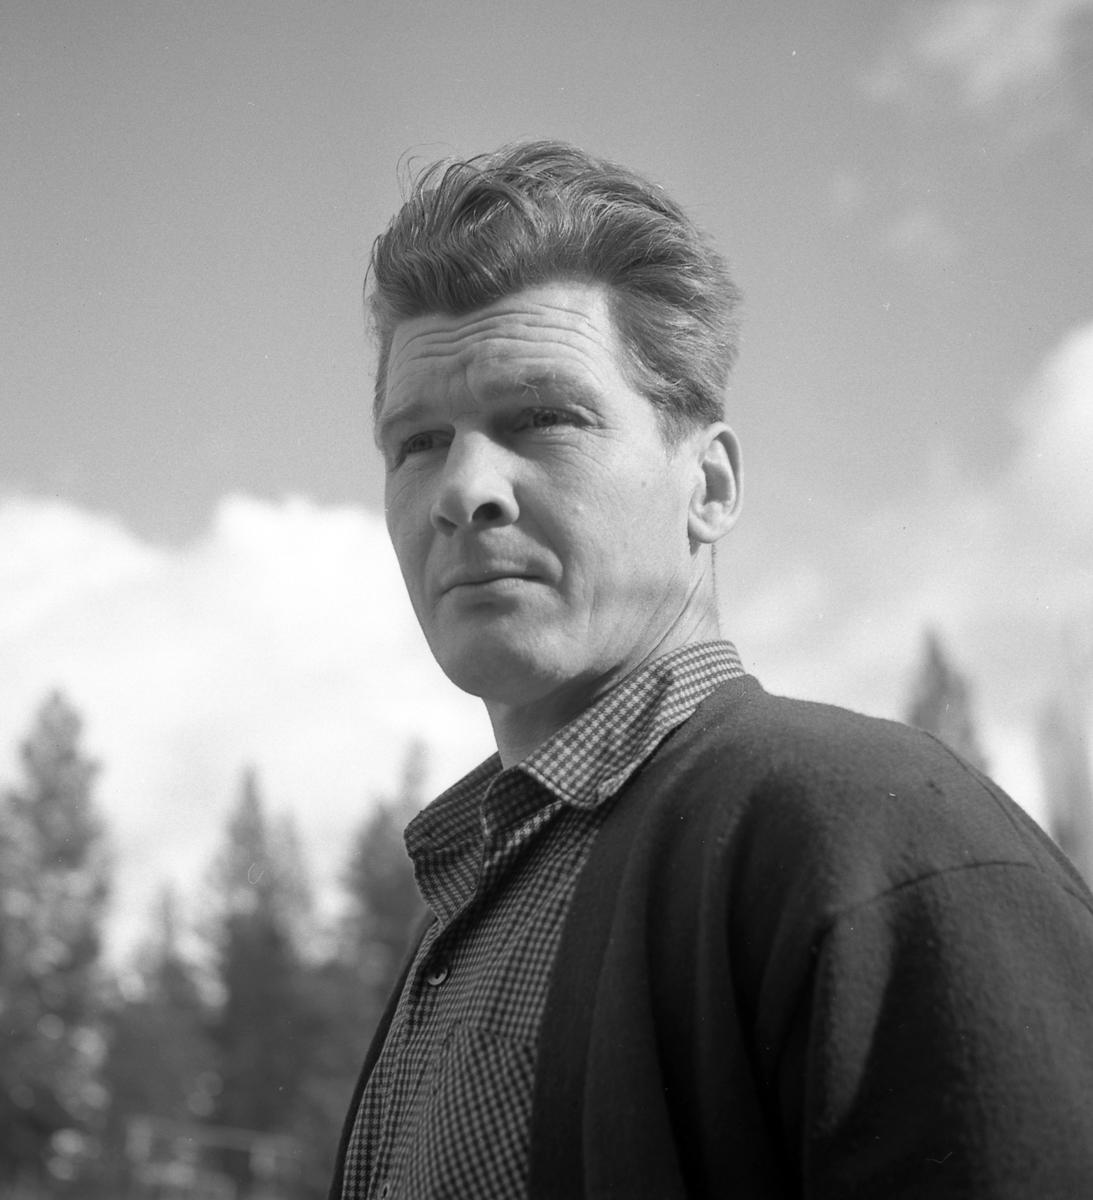 Johan E. Nordmoen